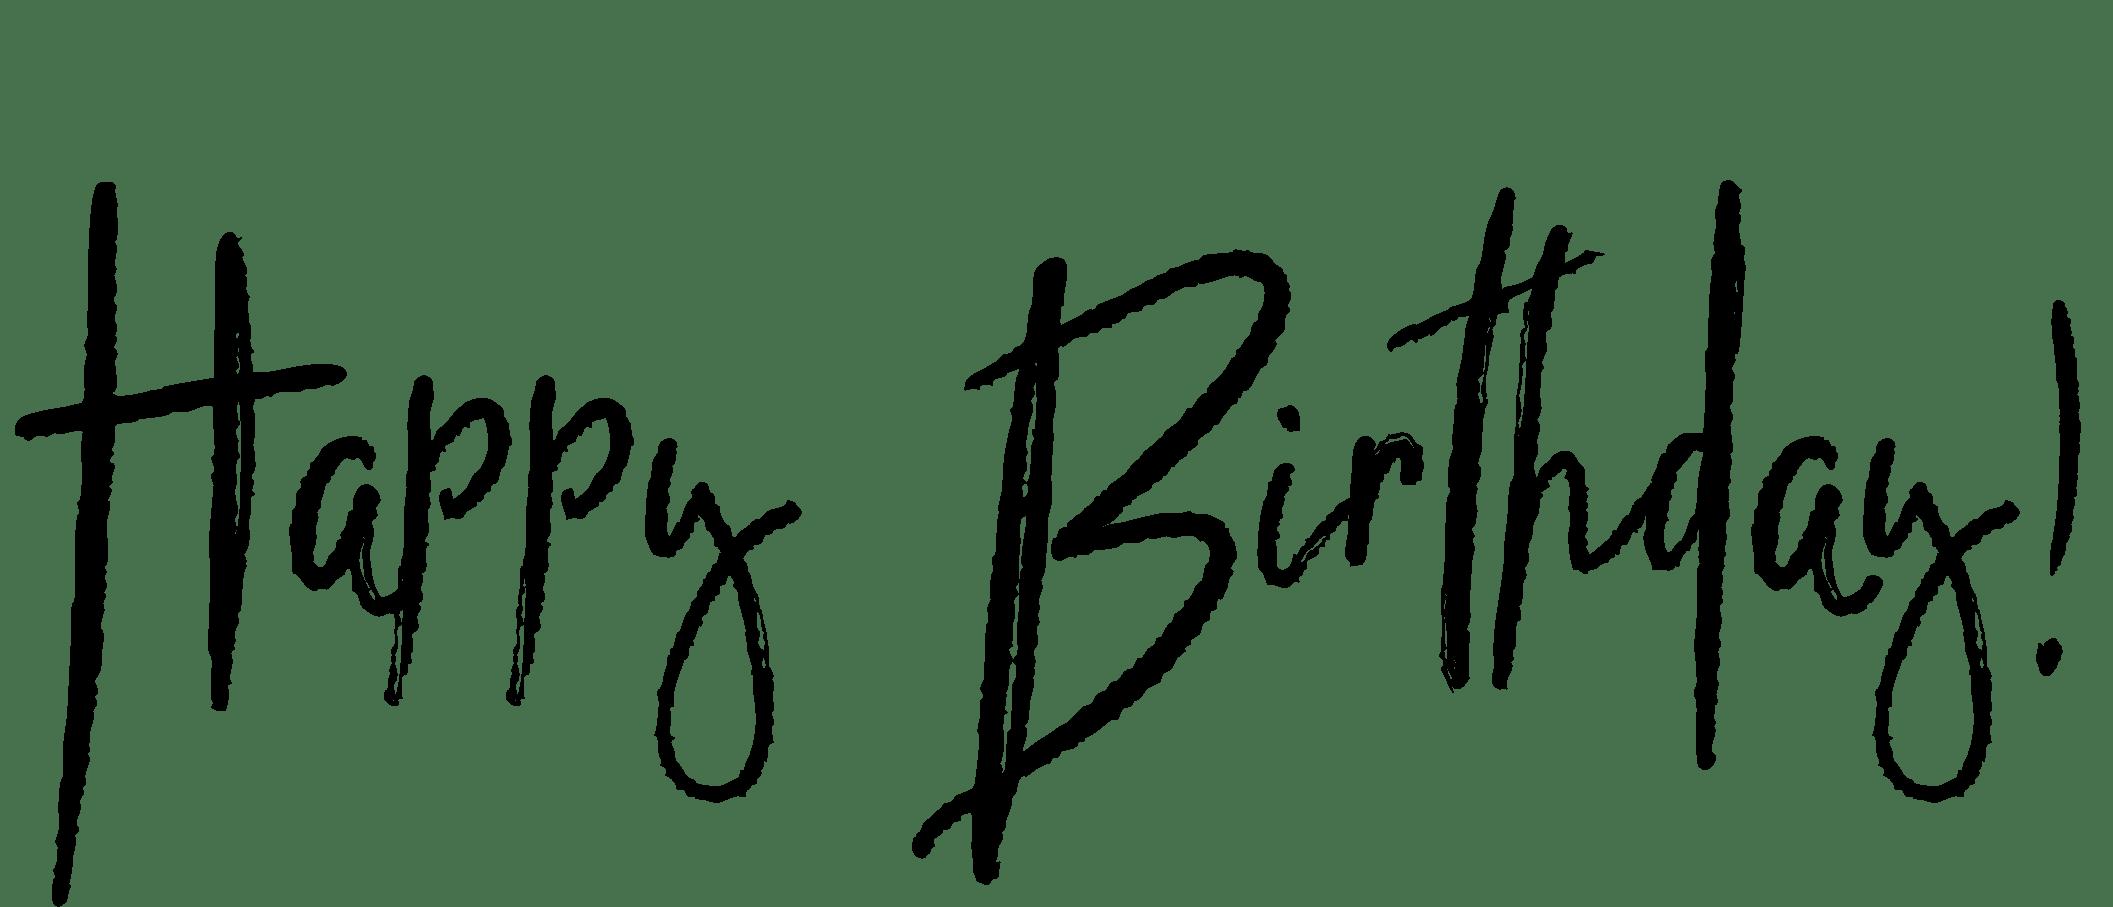 Transparent Birthday Tumblr | www.imgkid.com - The Image ...